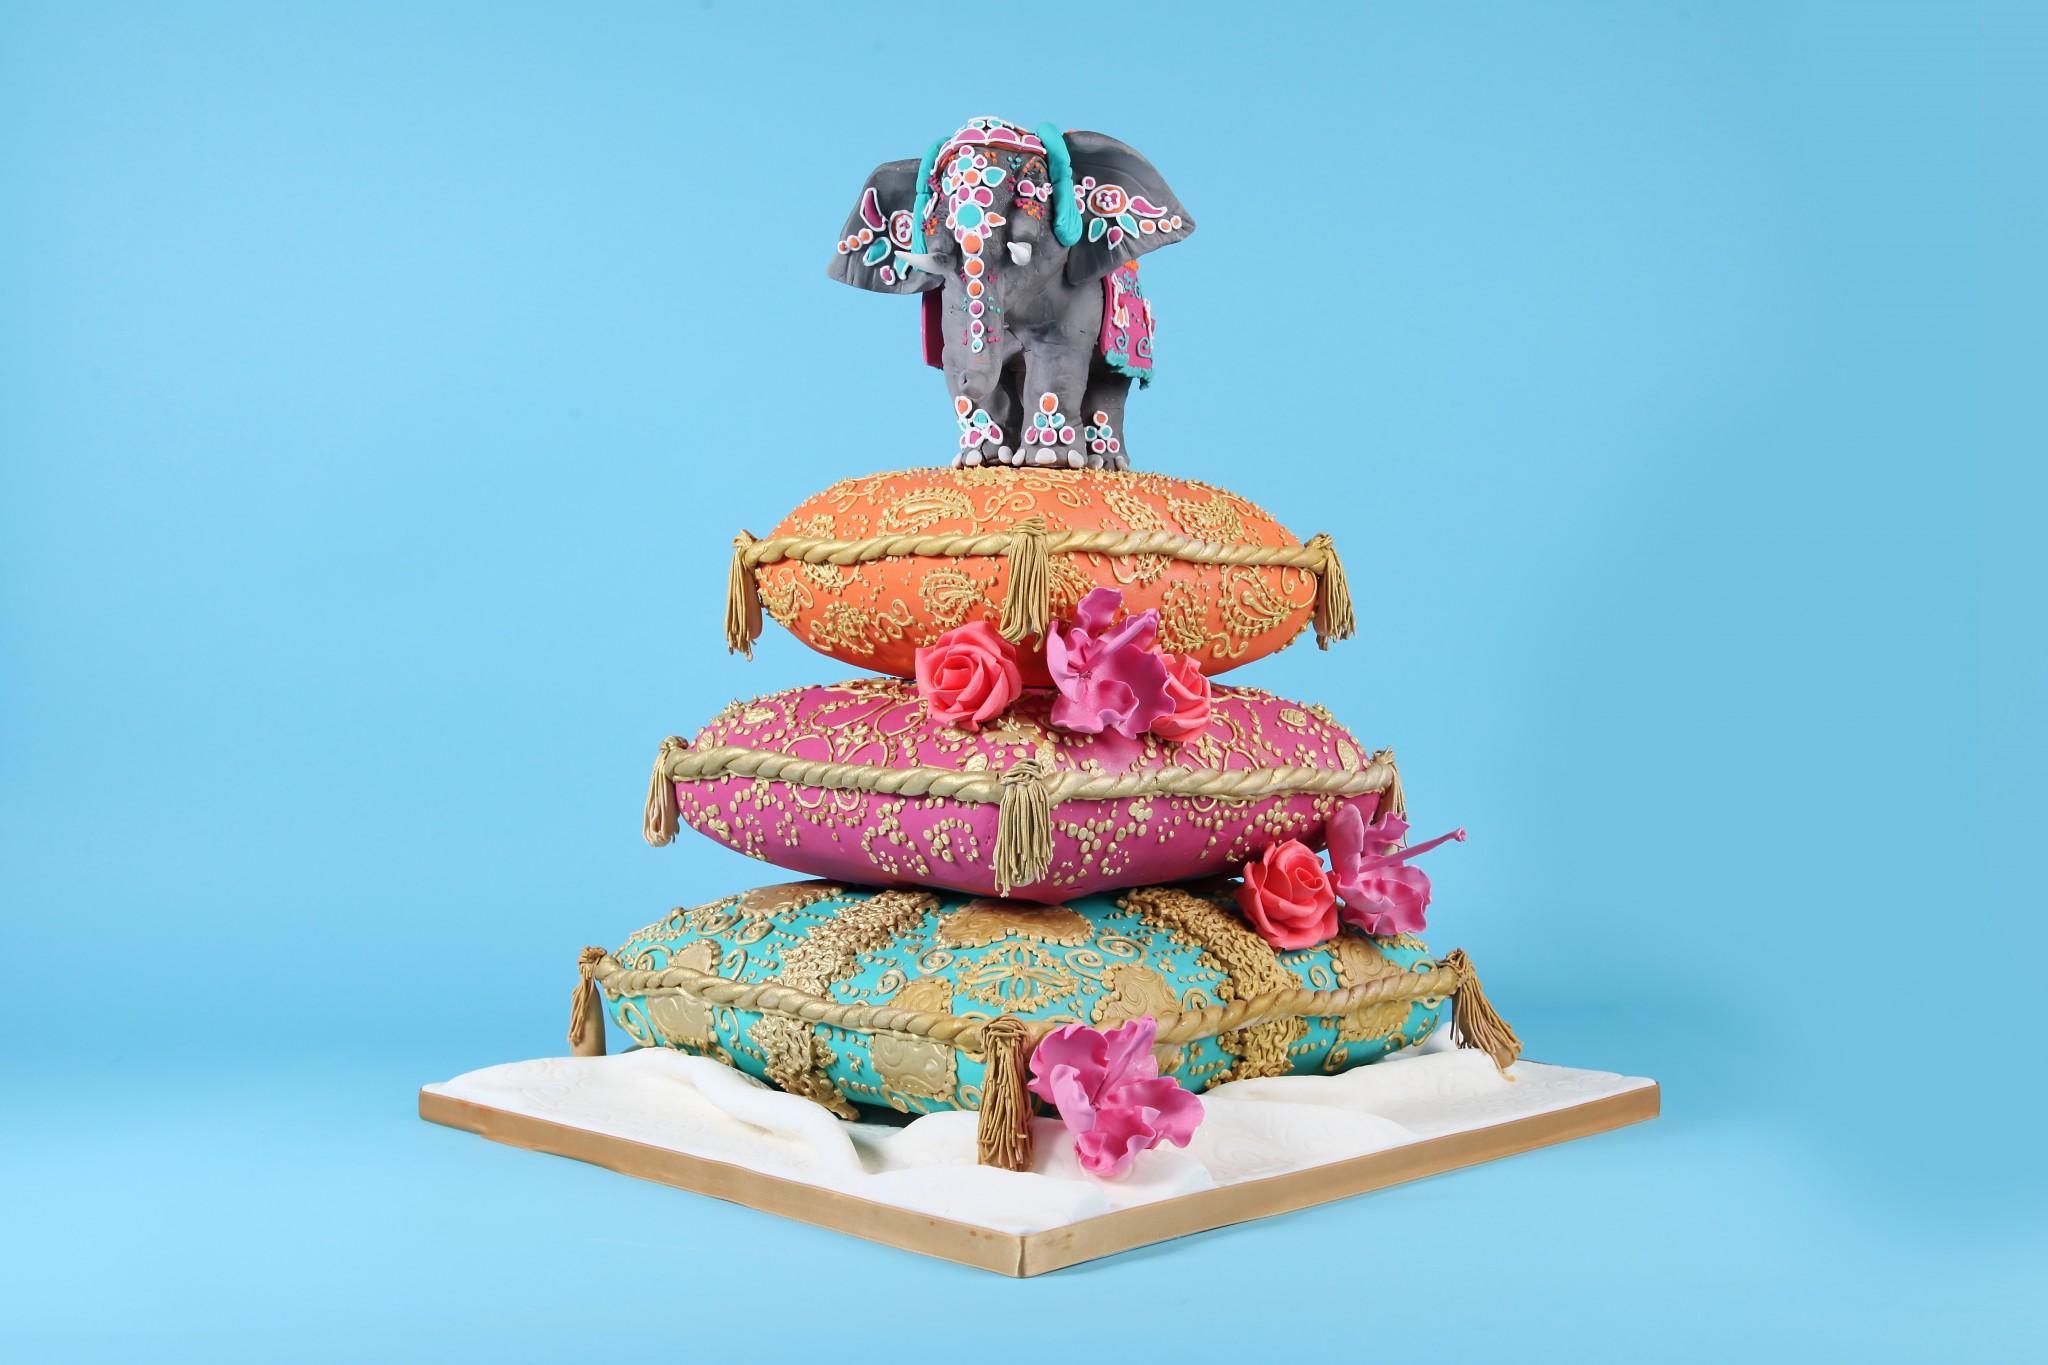 Elephant Birthday Cake Designs